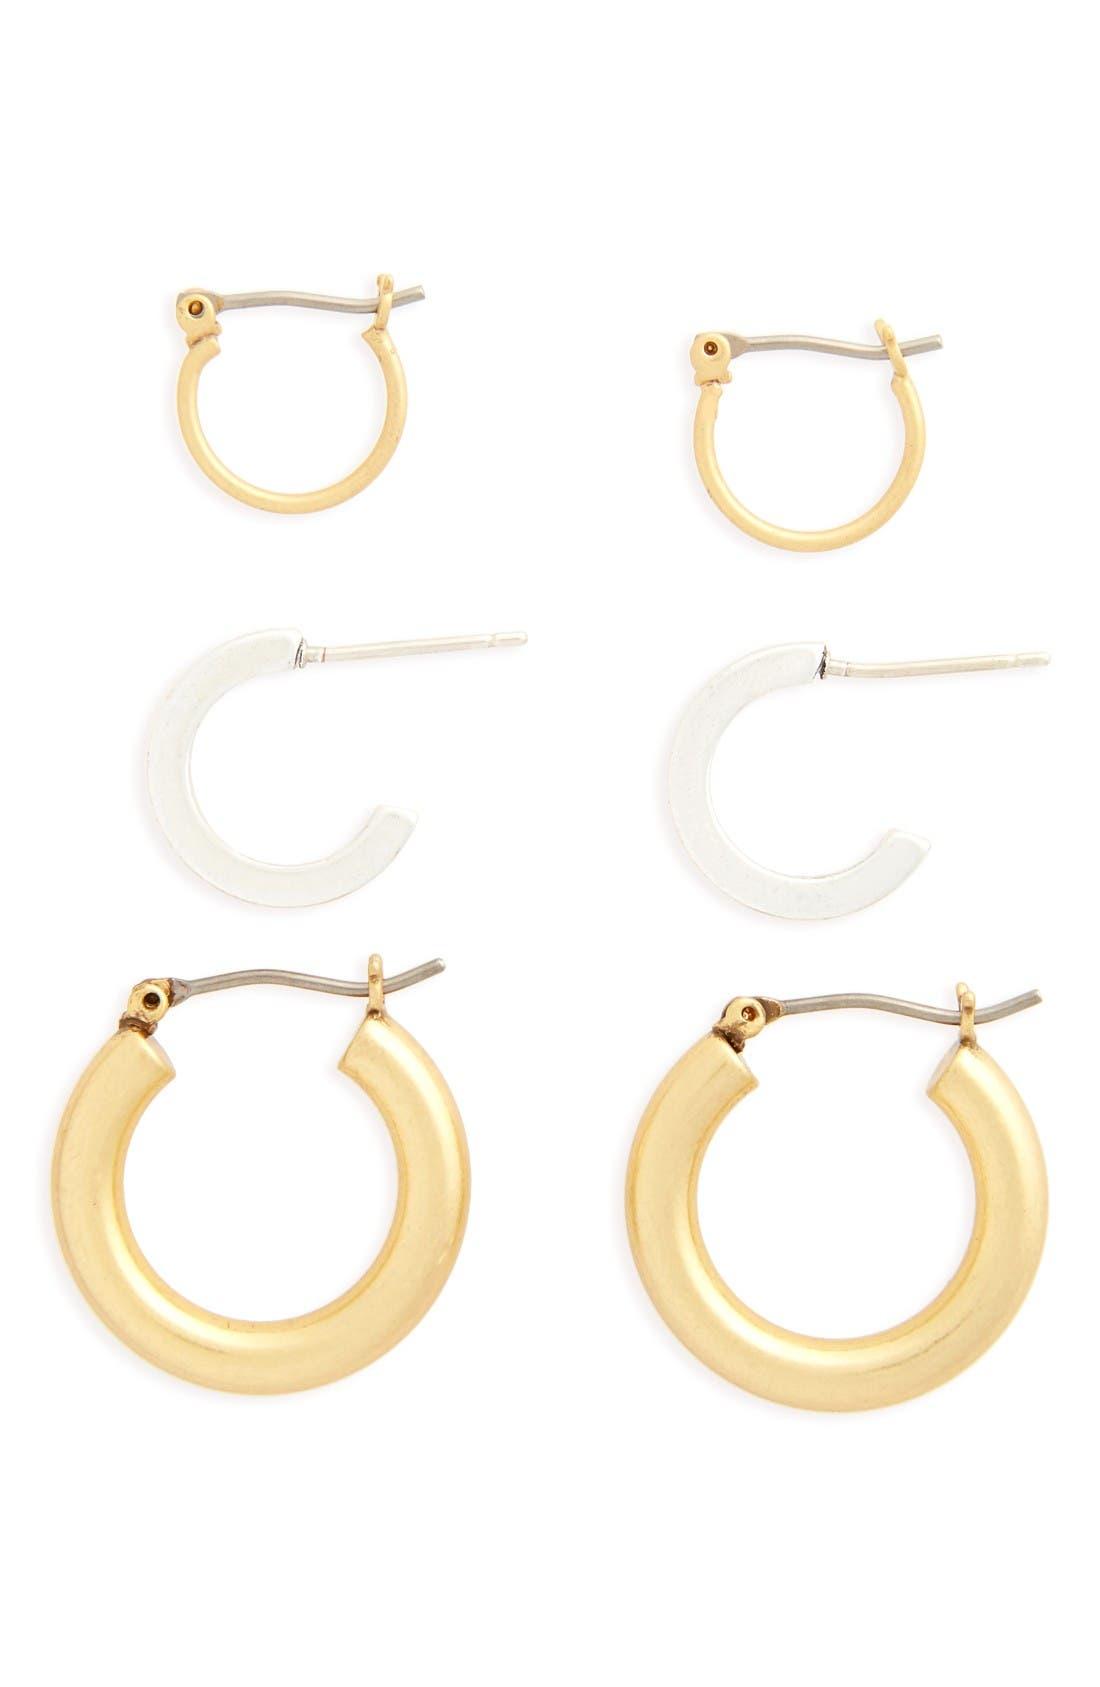 Set of 3 Mini Hoop Earrings,                         Main,                         color, Mixed Metal